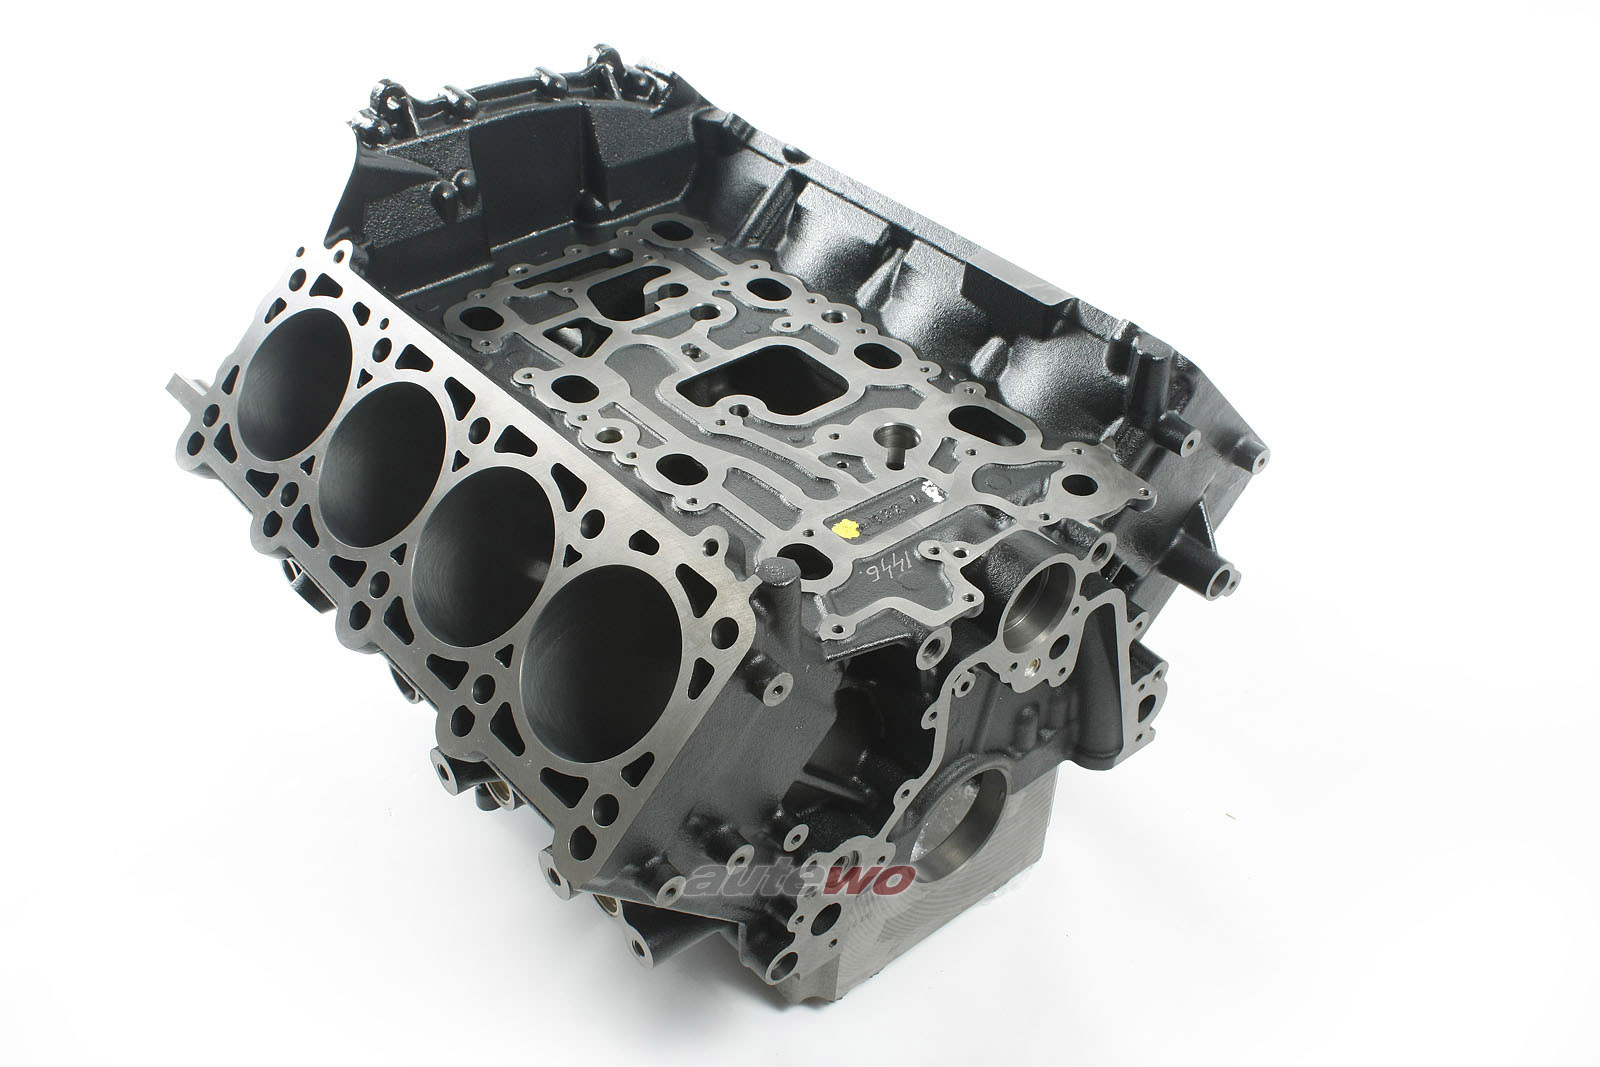 057100103B 057103011R NEU Audi A8 D3 4.0l Motorblock/Kurbelgehäuse